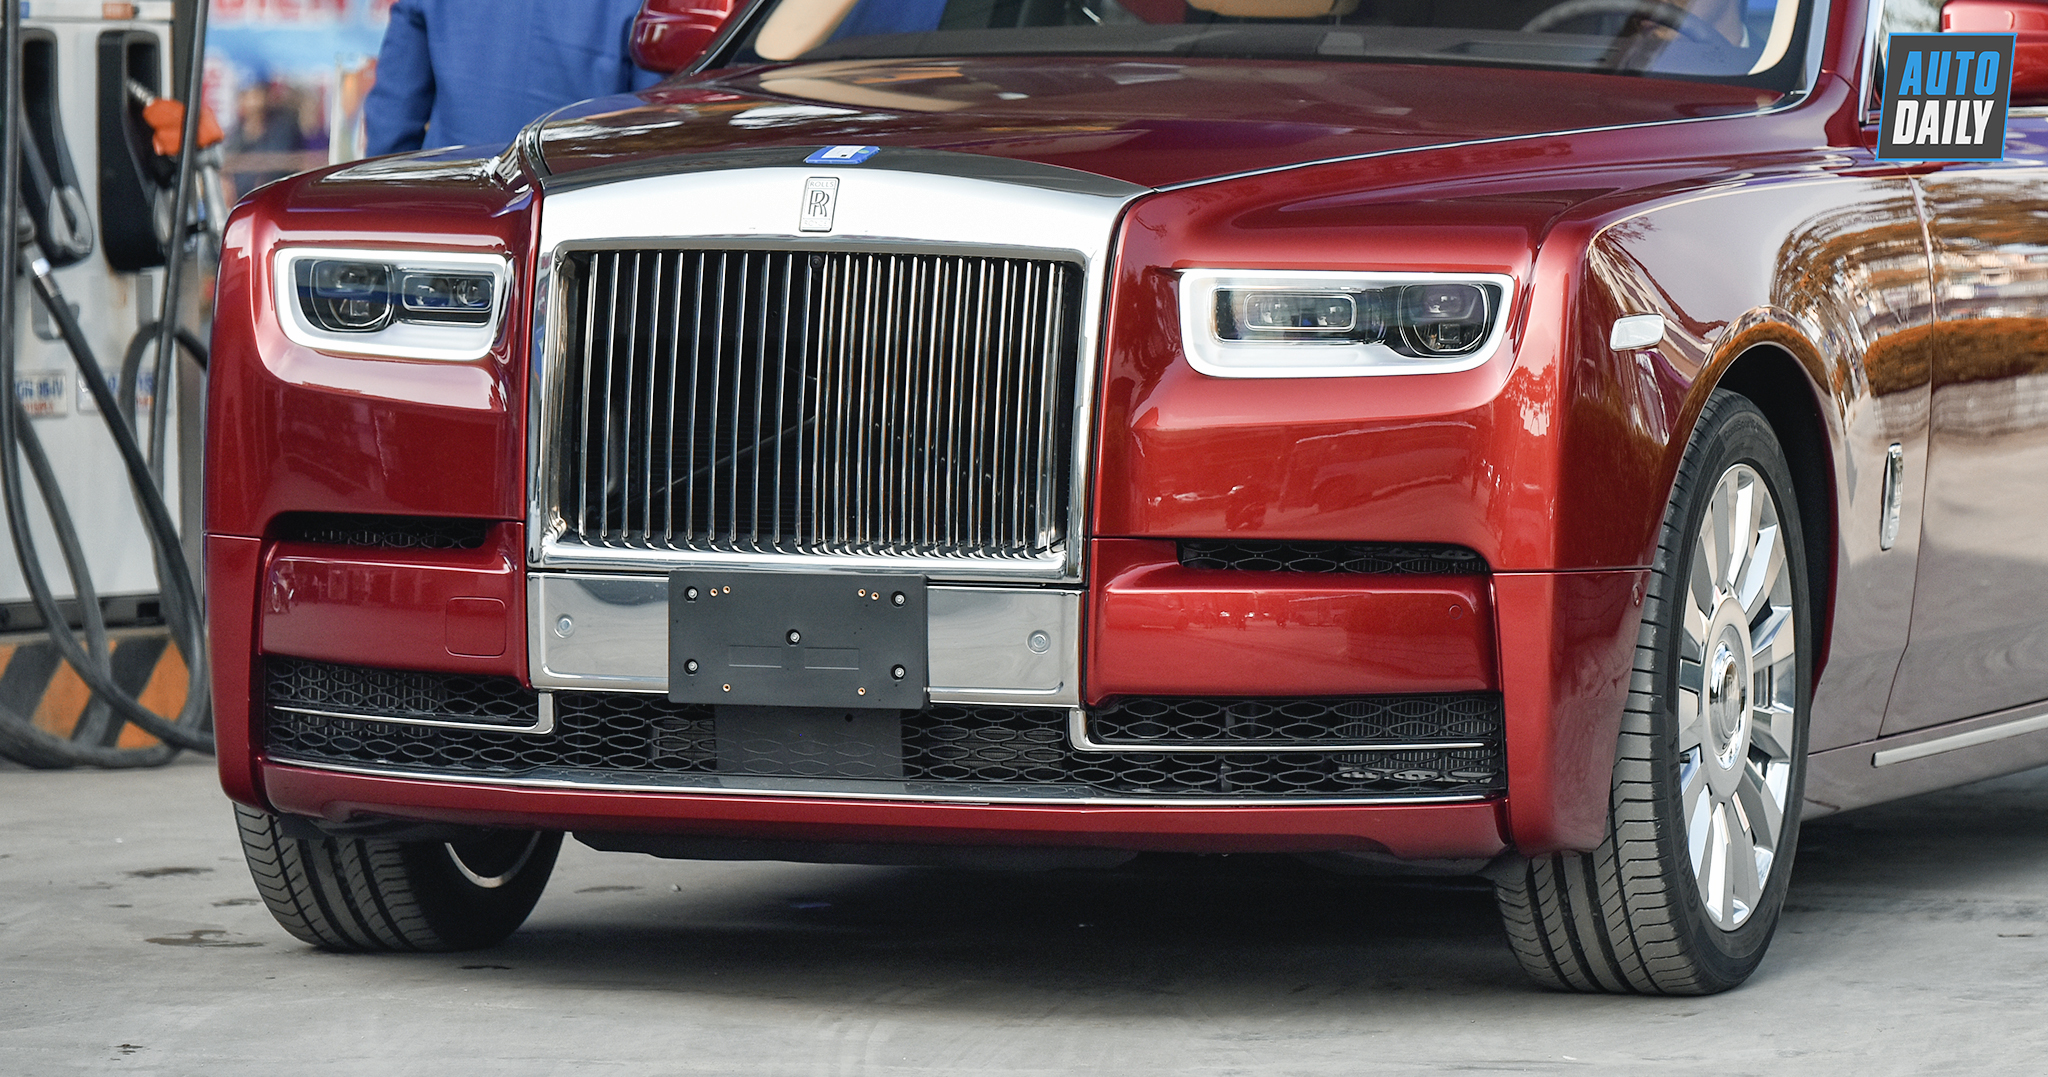 rolls-royce-phantom-2018-autodaily-10.jpg